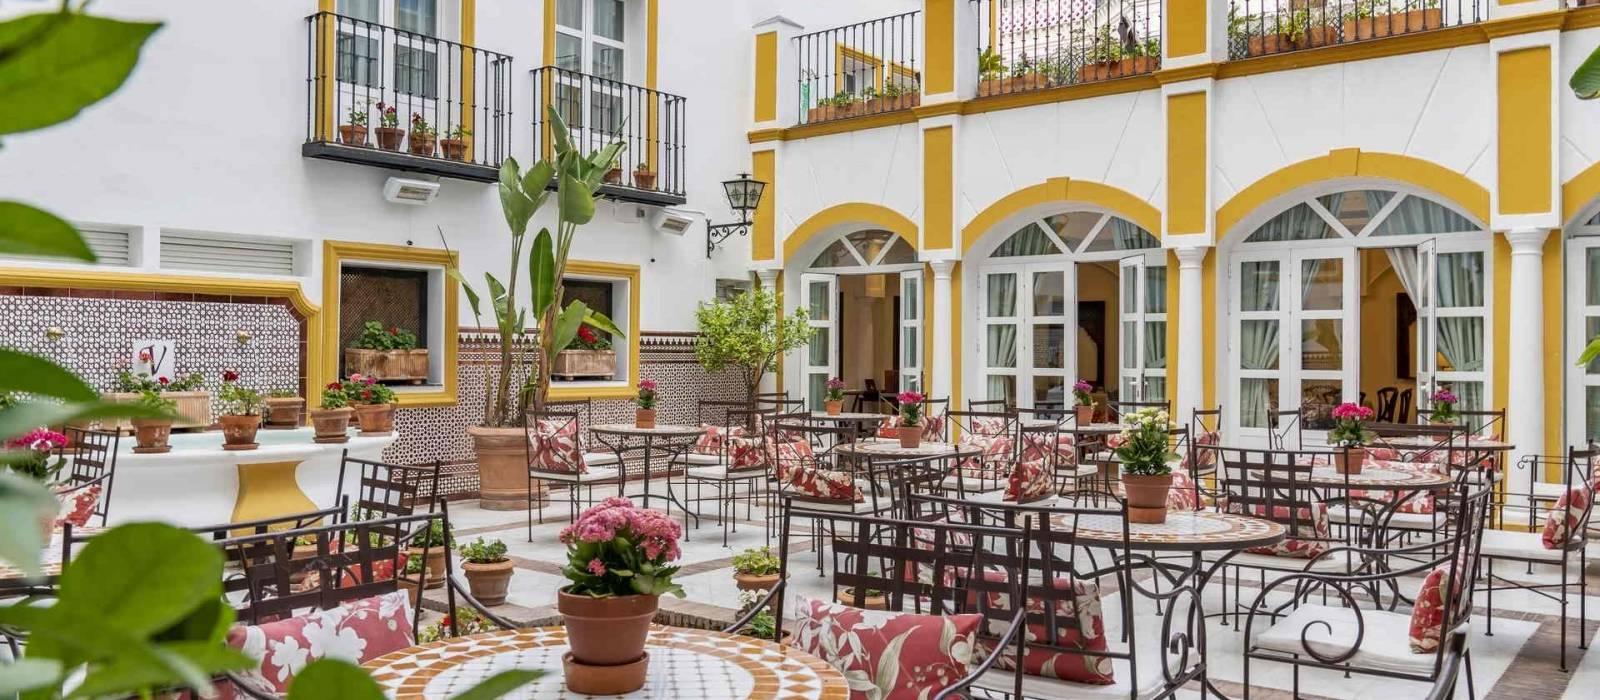 Services hotel sevilla la r bida vincci hotels - Fotos patio andaluz ...